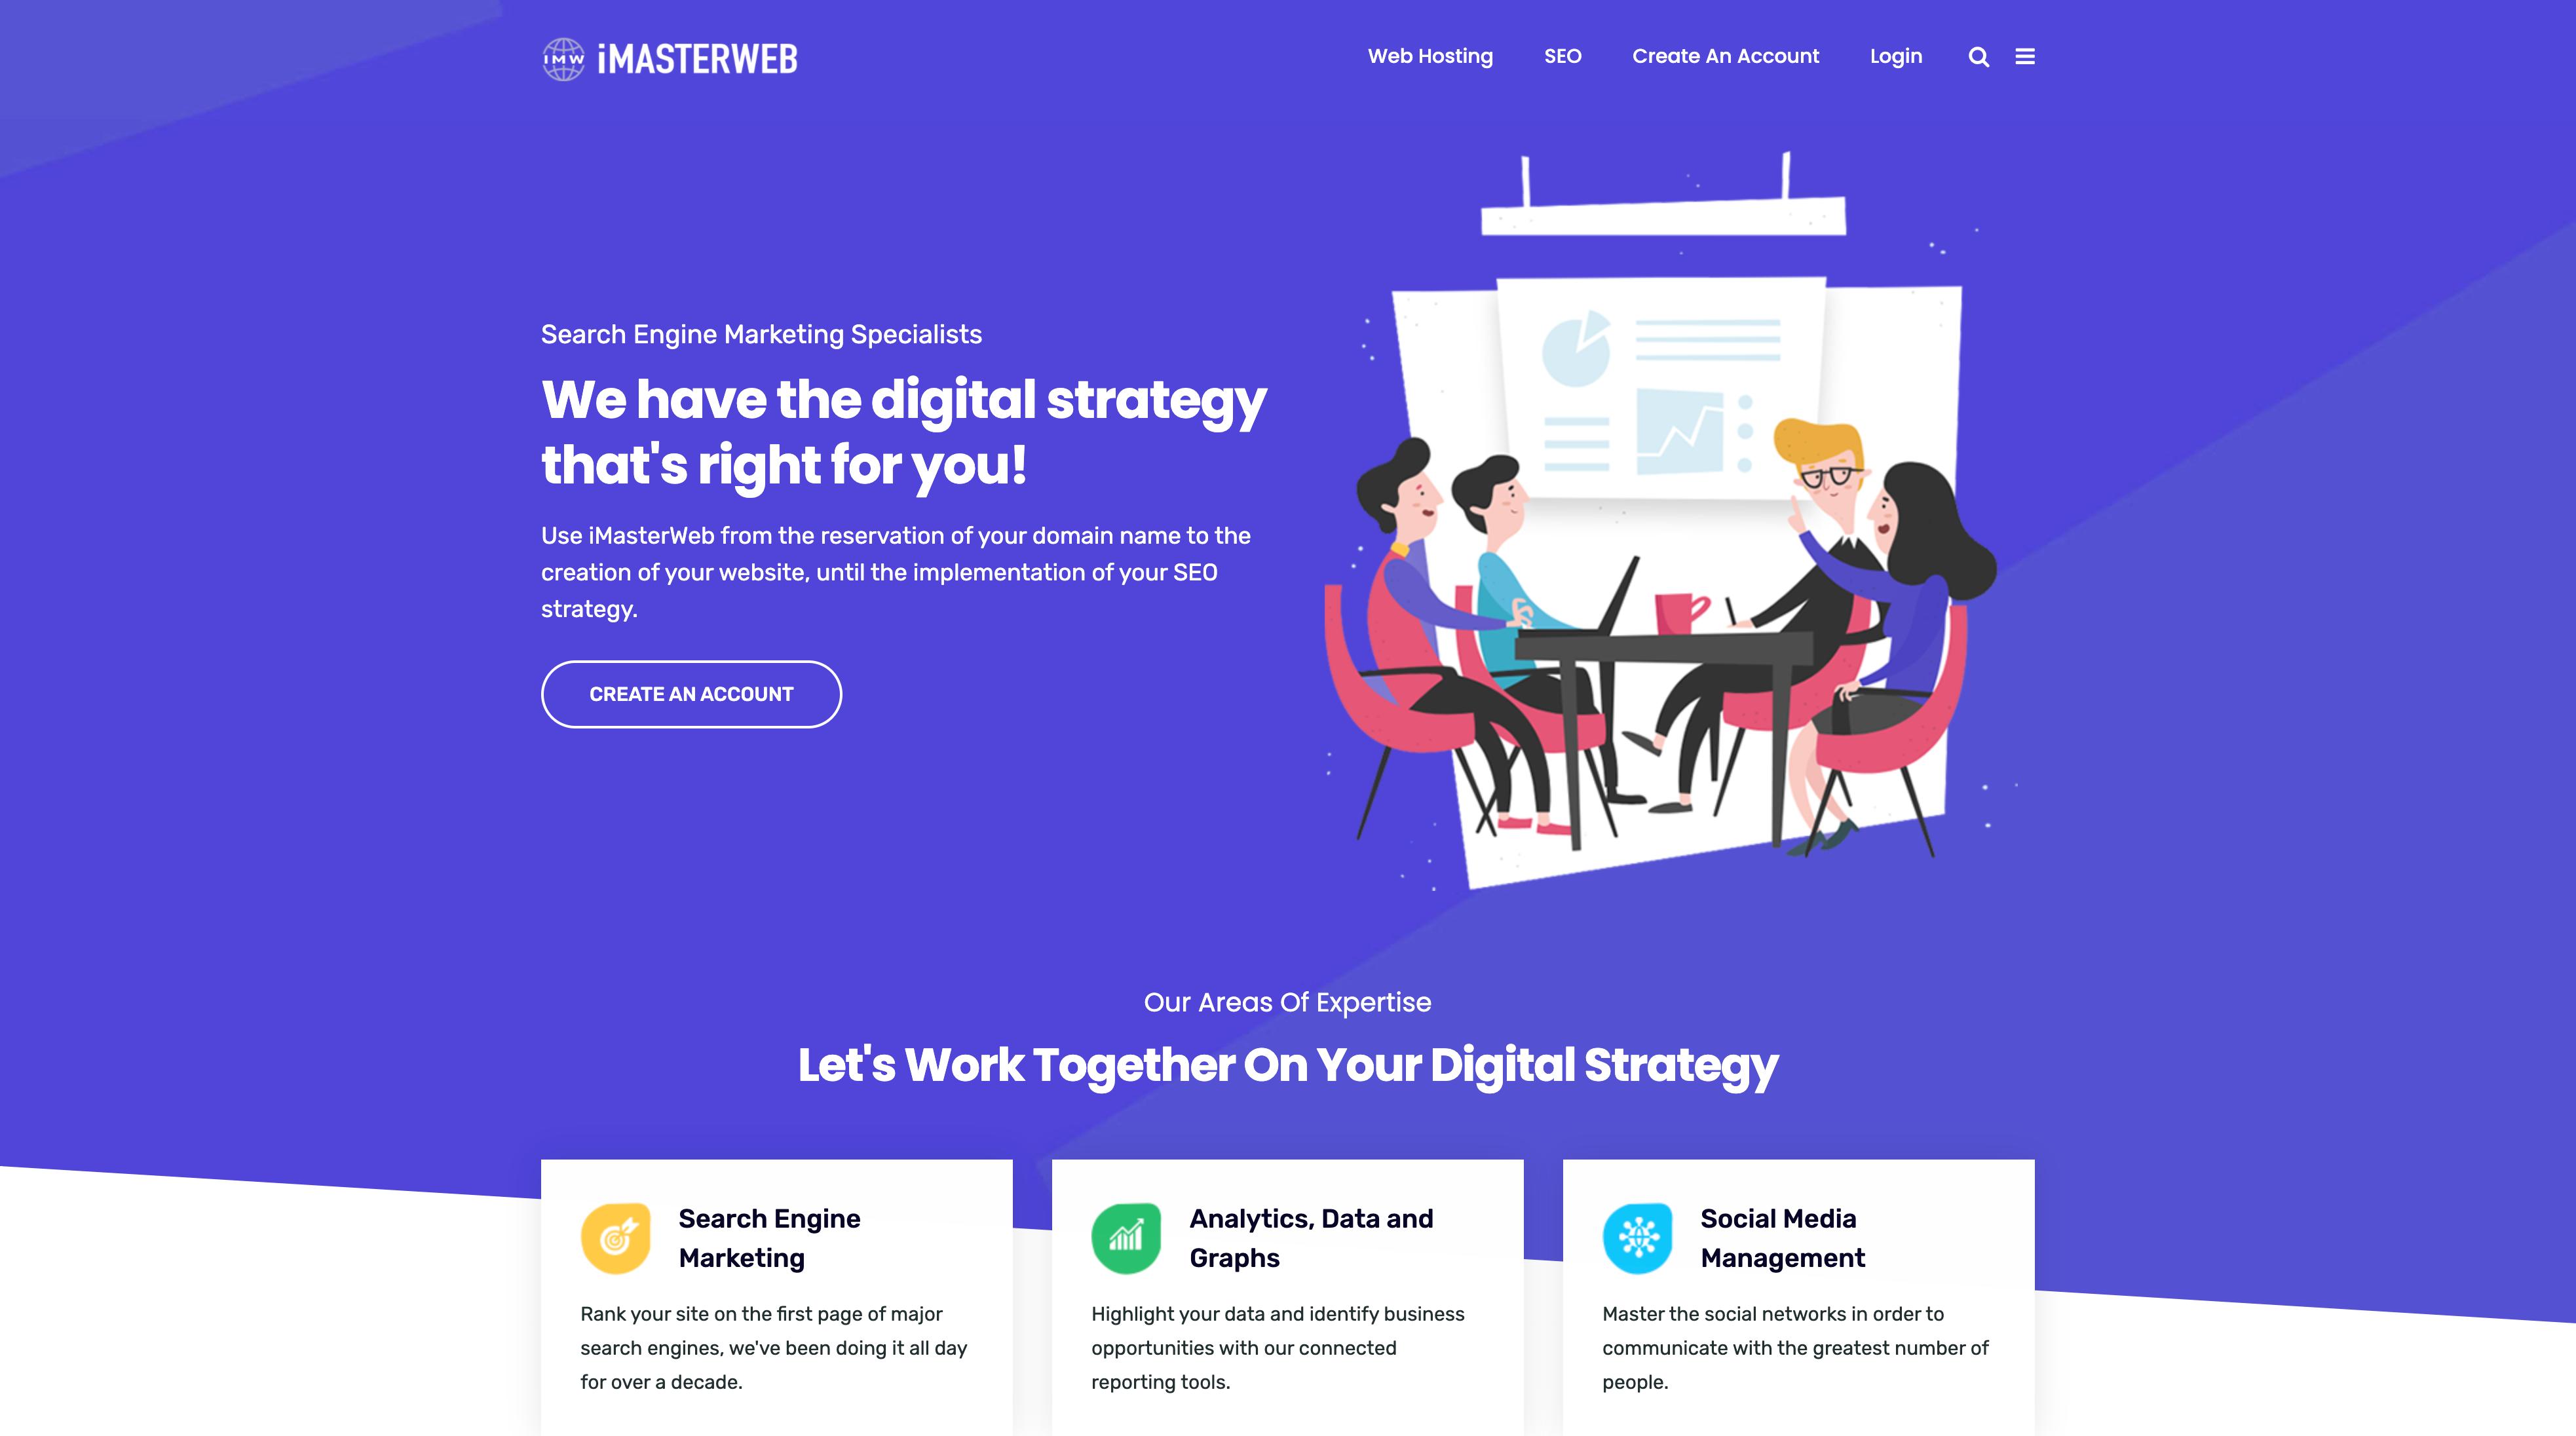 iMasterWeb-Search-Engine-Marketing-and-Website-Hosting (1)